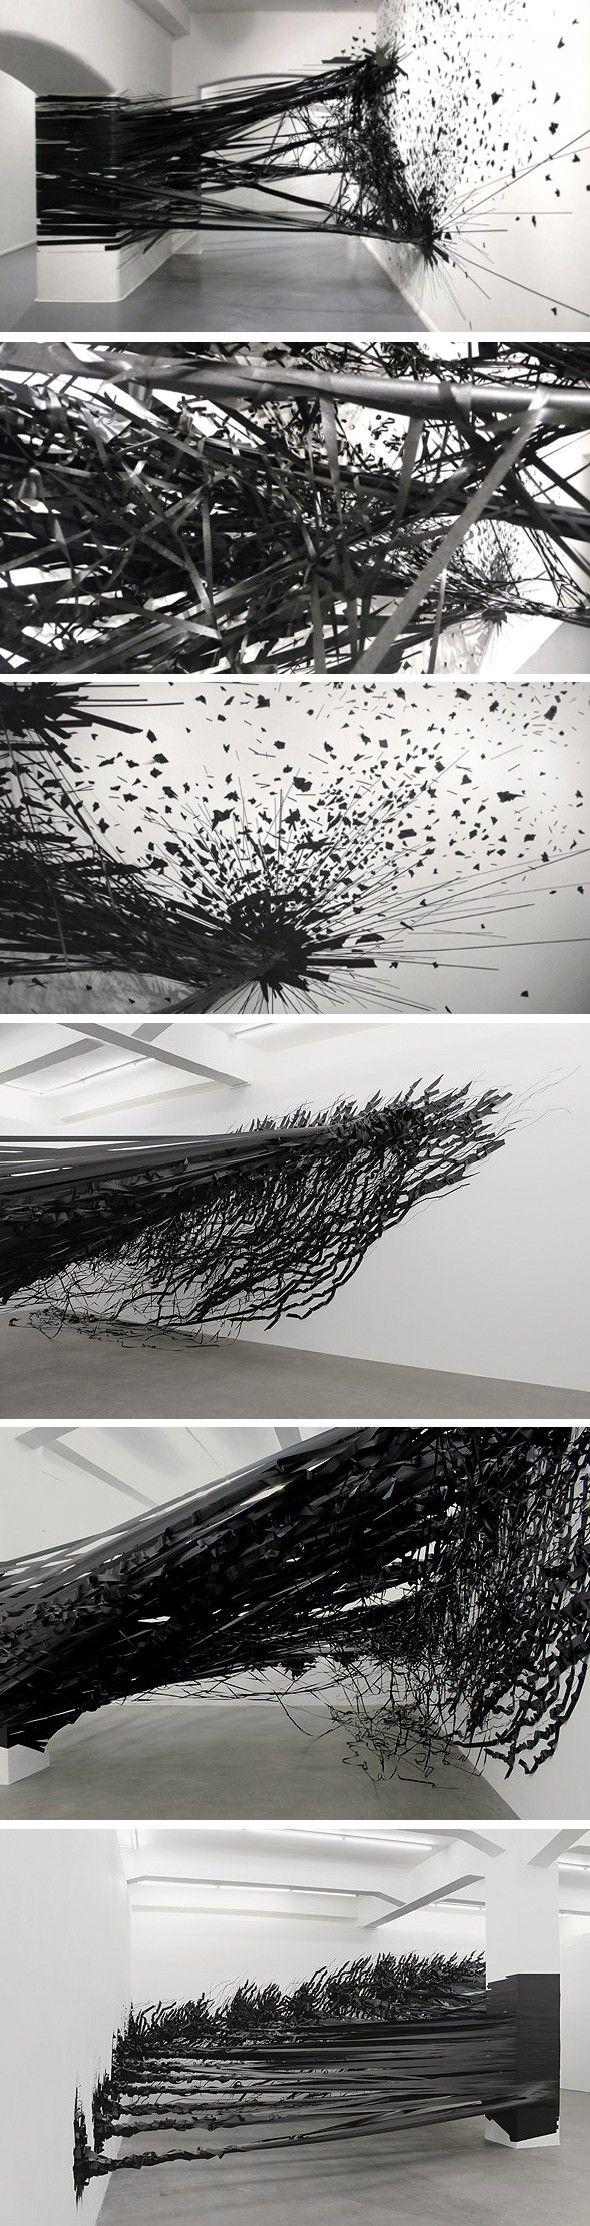 http://www.journal-du-design.fr/art/installation-aerial-par-monika-grzymala-24271/